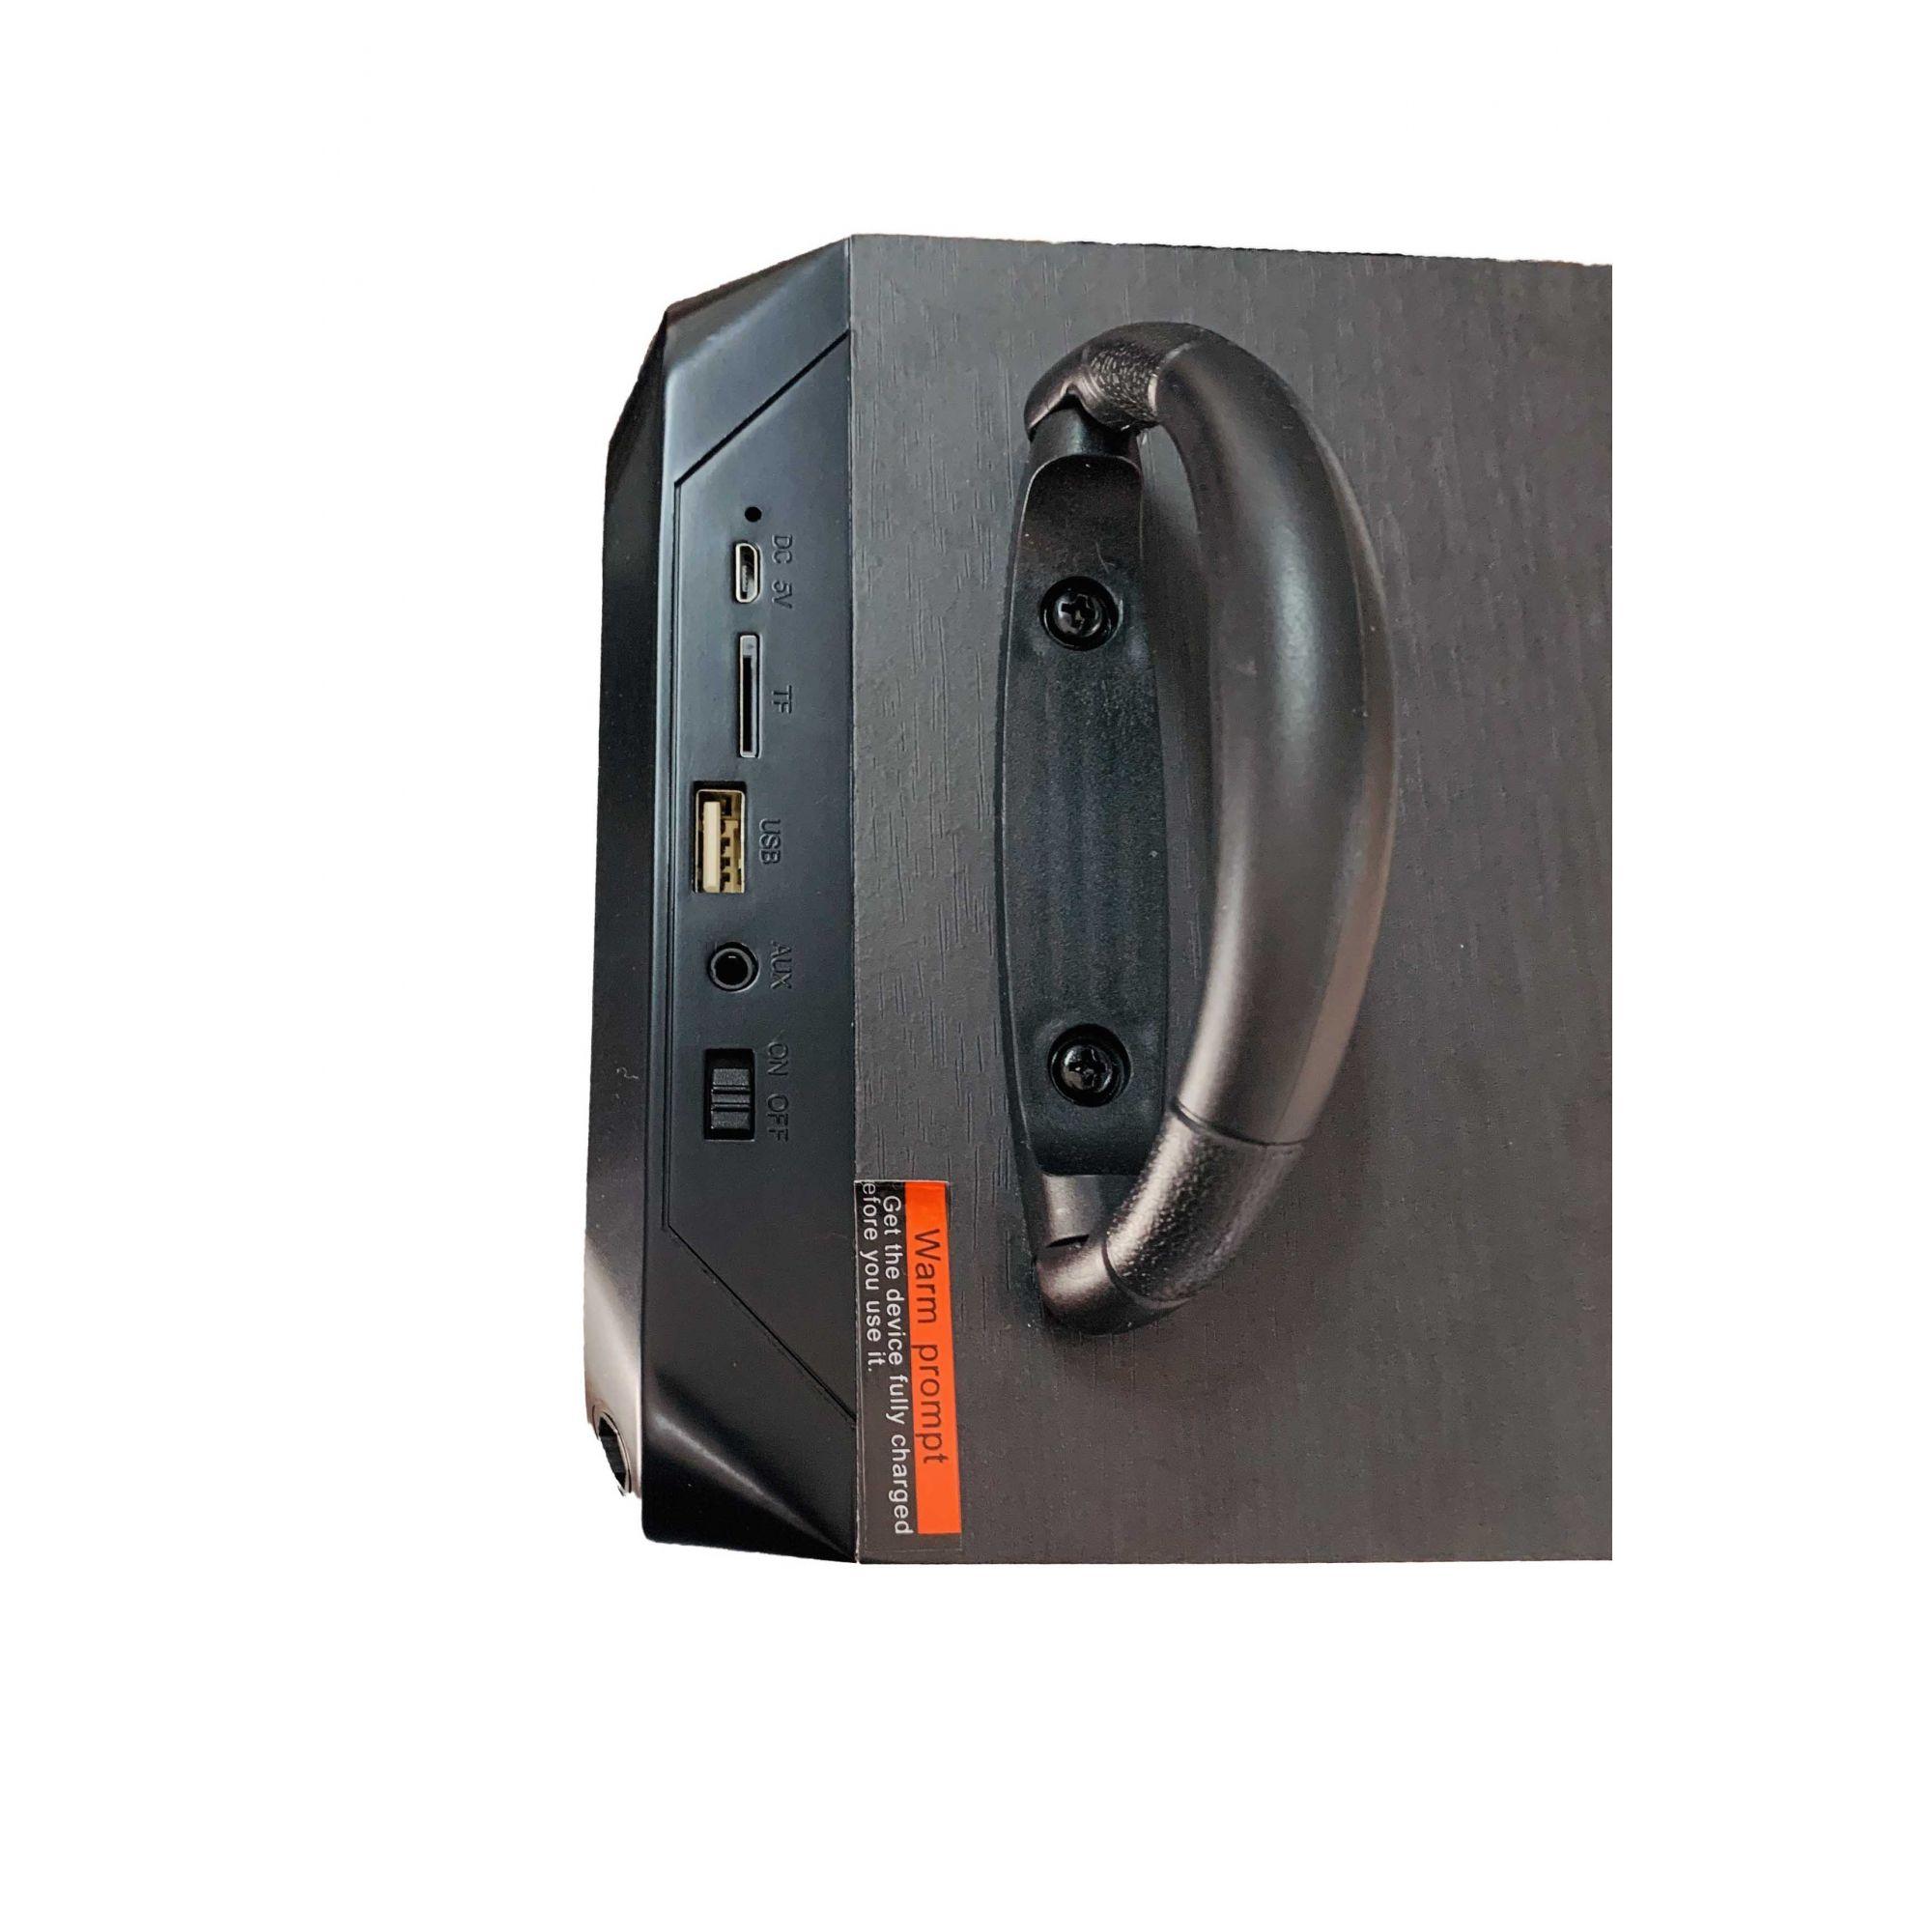 Caixa de som Inova RAD-8098